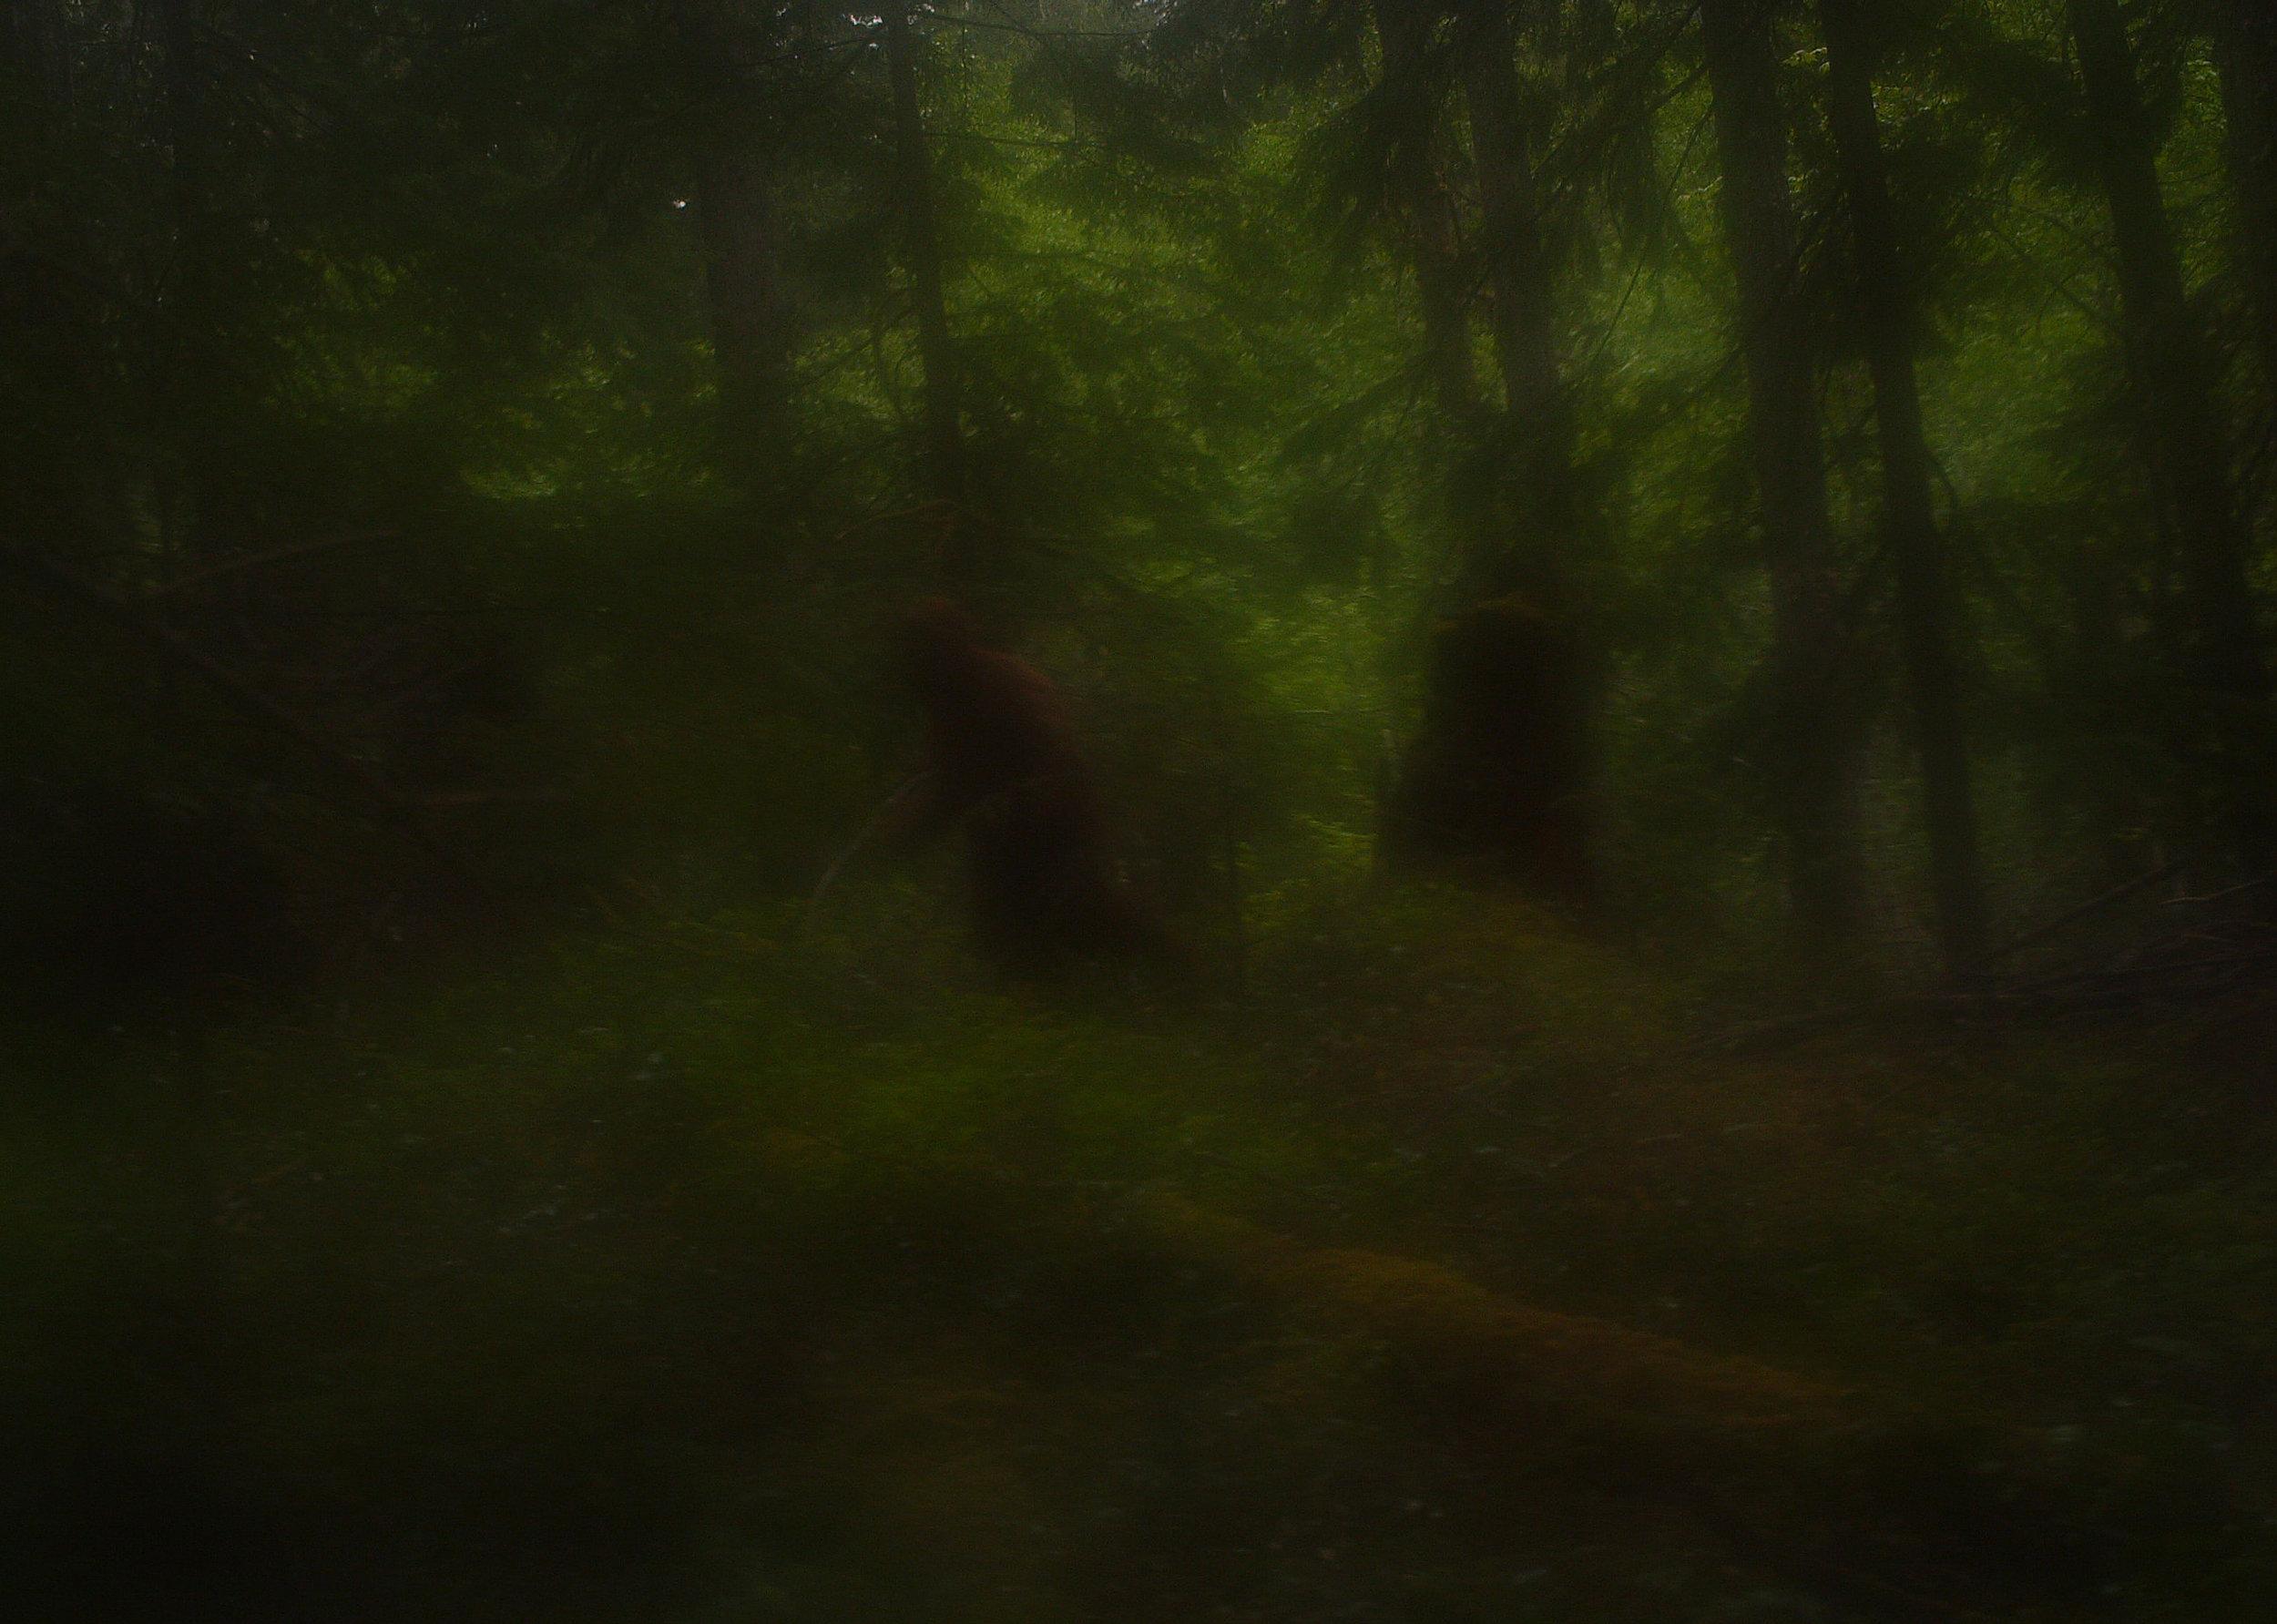 Sasquatch Sighting, Blurred Grove